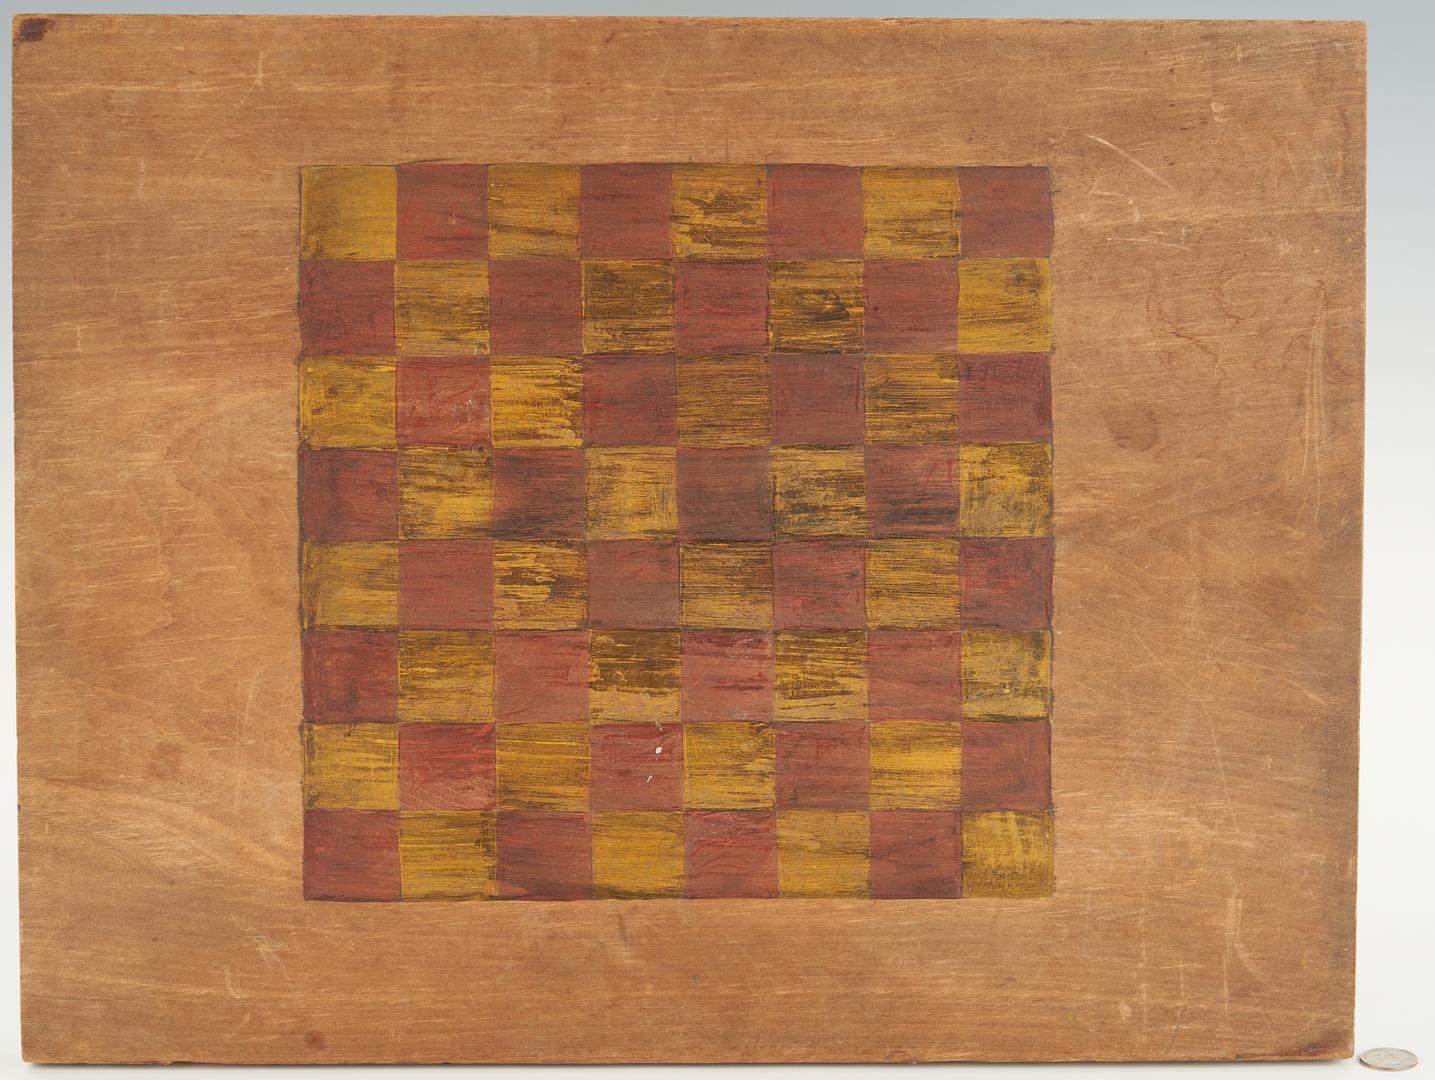 Lot 771: Civil War Checkerboard, Pvt. J. Witham Jr, 27th Maine